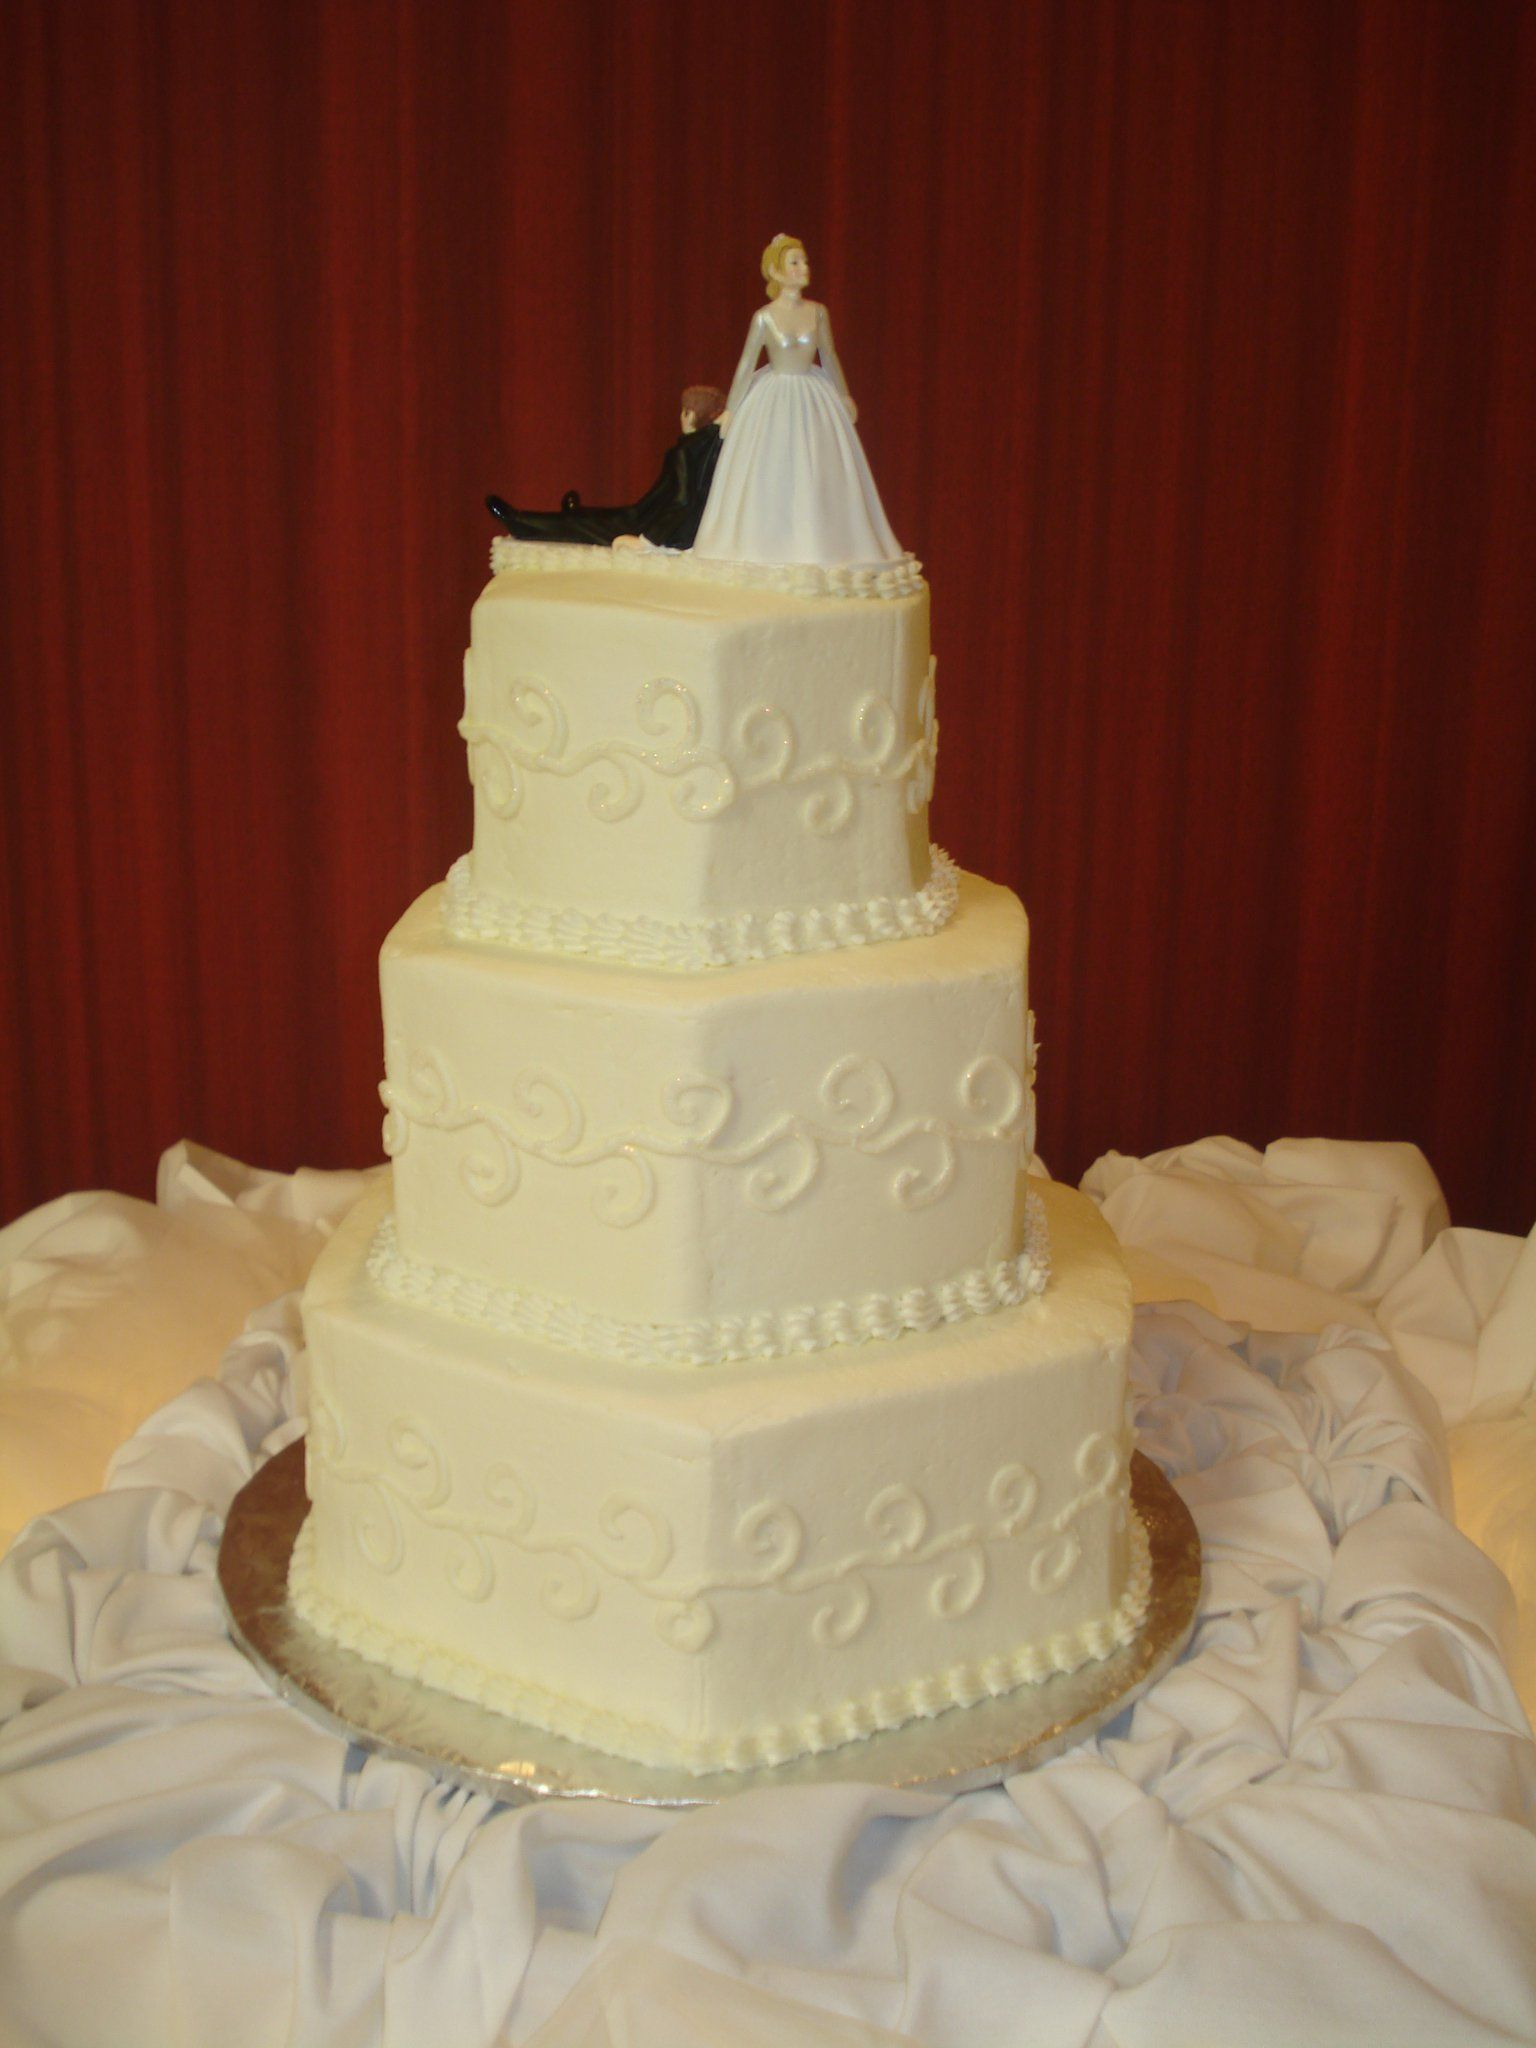 Hexagon wedding cake with cheesy bride and groom topper :)   Wedding ...